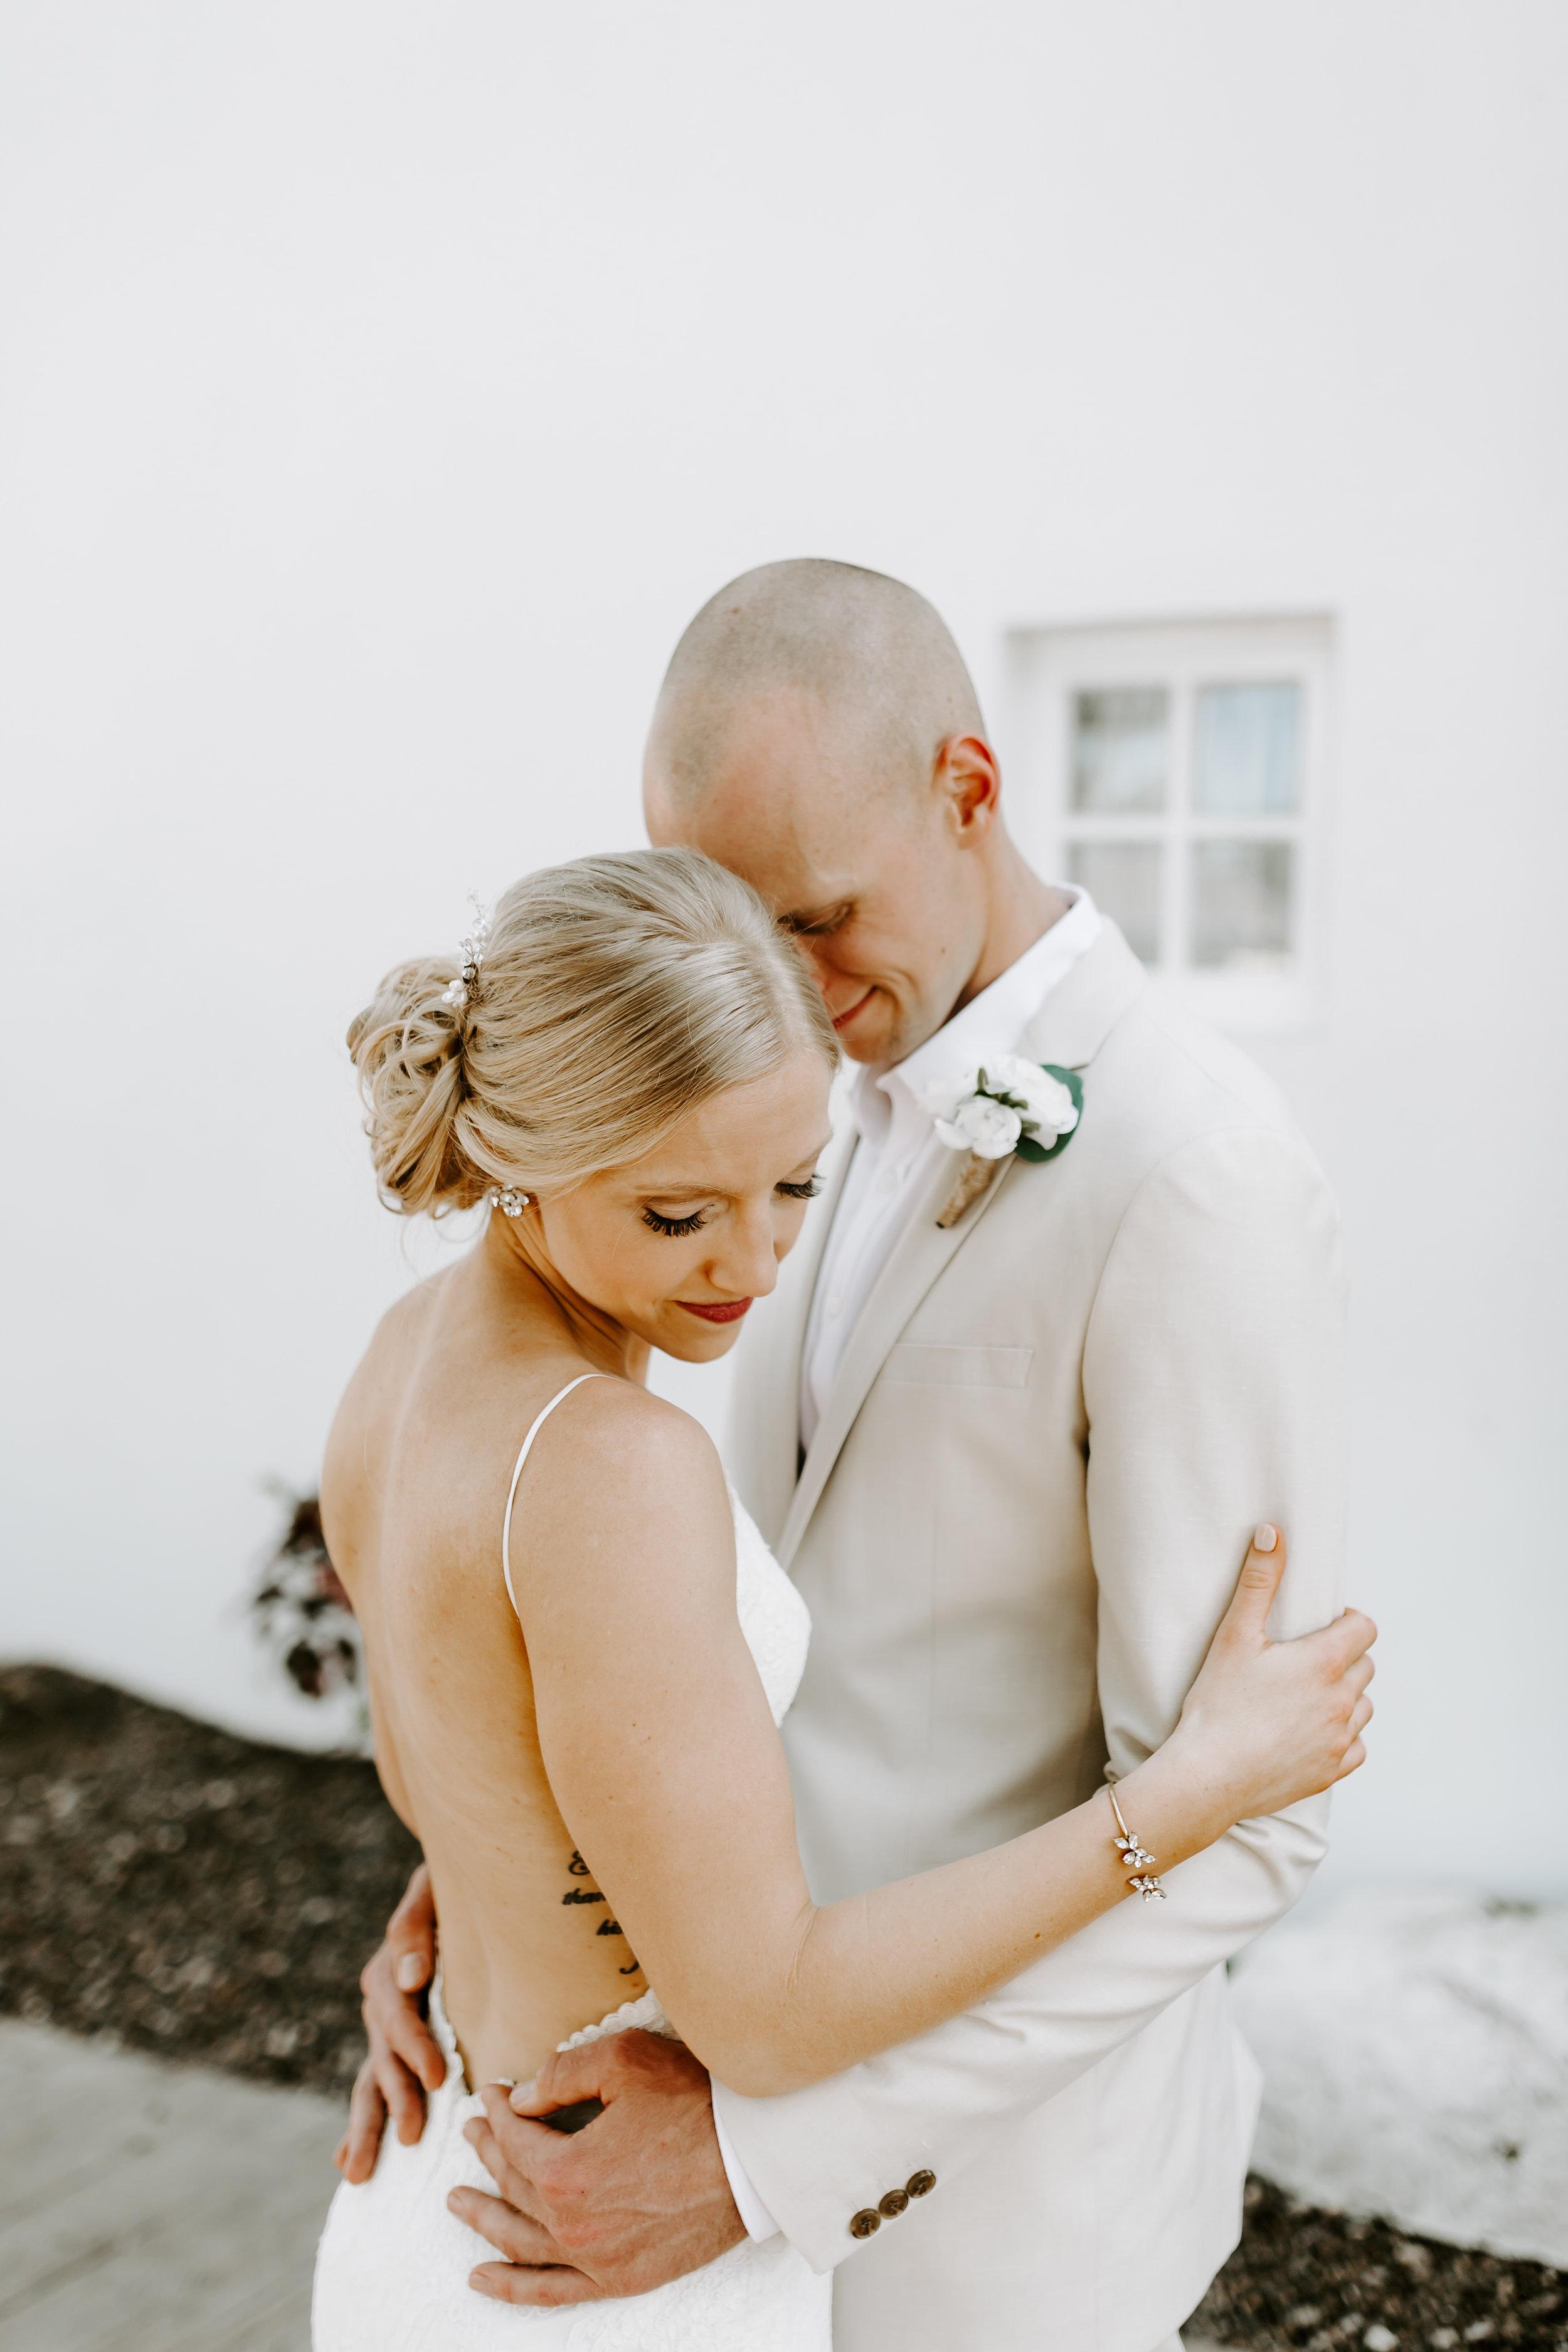 backless wedding dress, katie may, katie may bridal, beach wedding destination wedding, jamaica wedding, bride and groom, wedding day, beach bride, define fettle